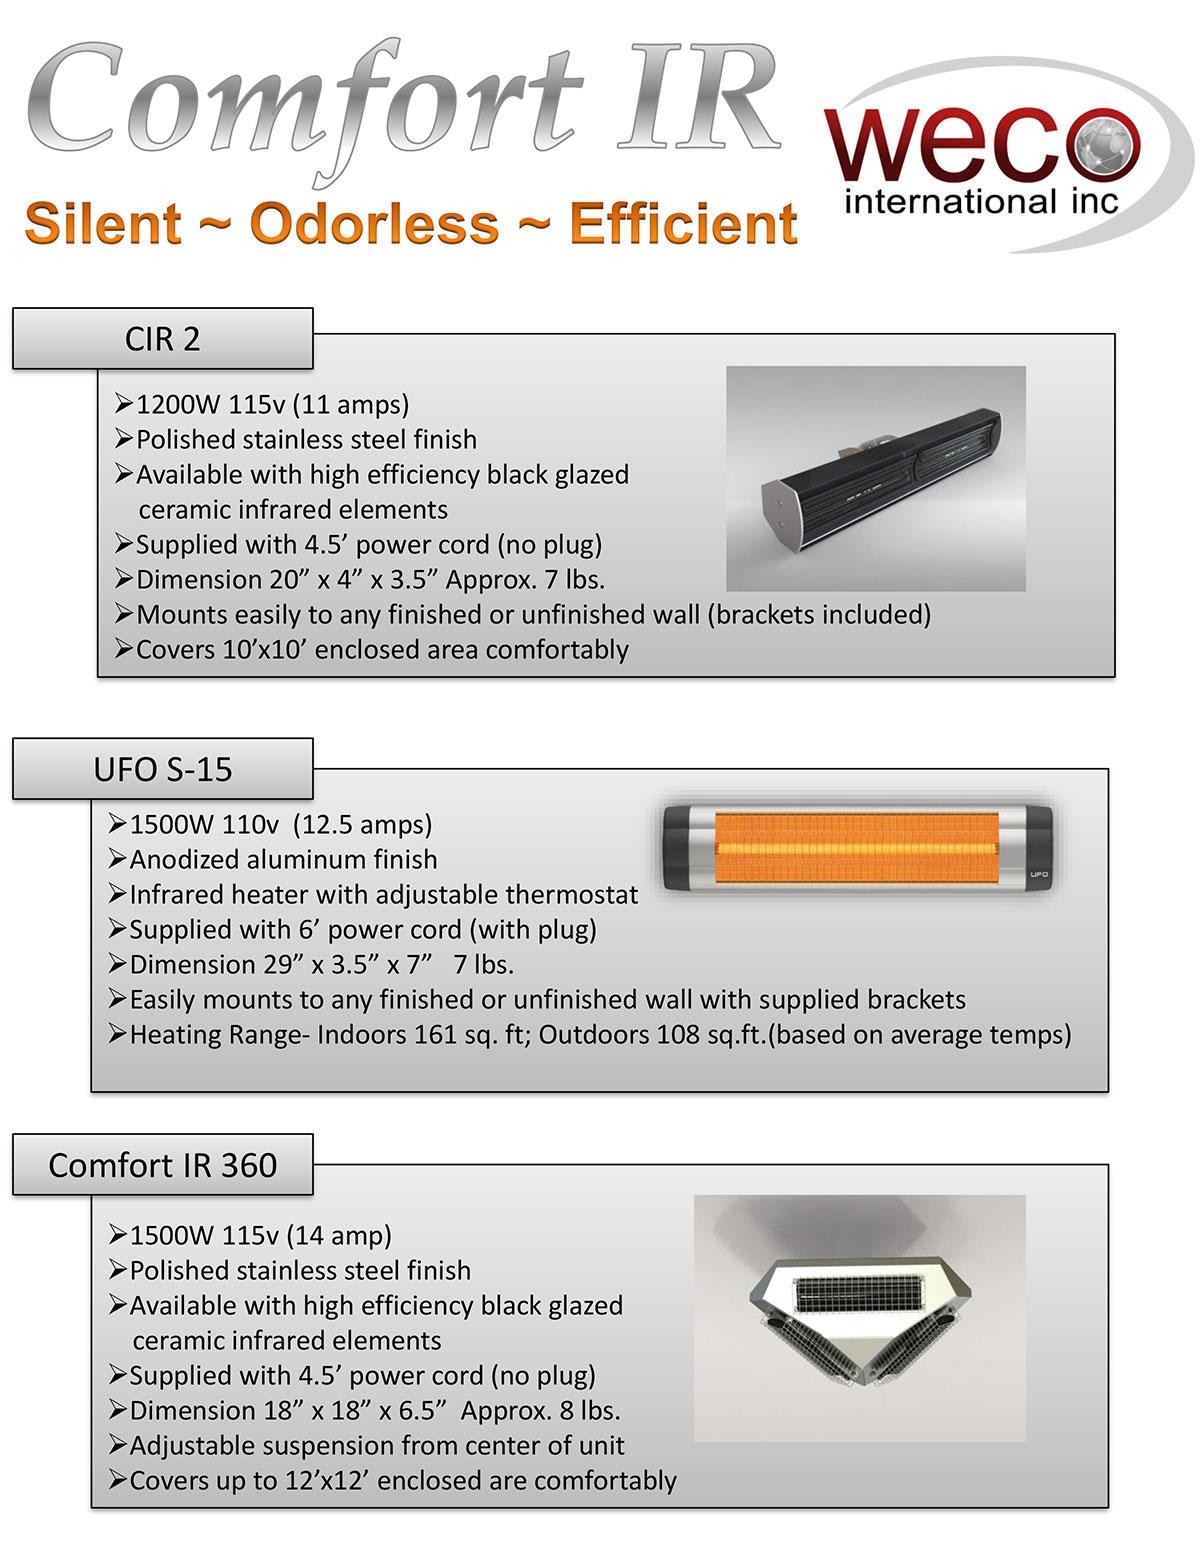 WECO Comfort Infrared Catalog